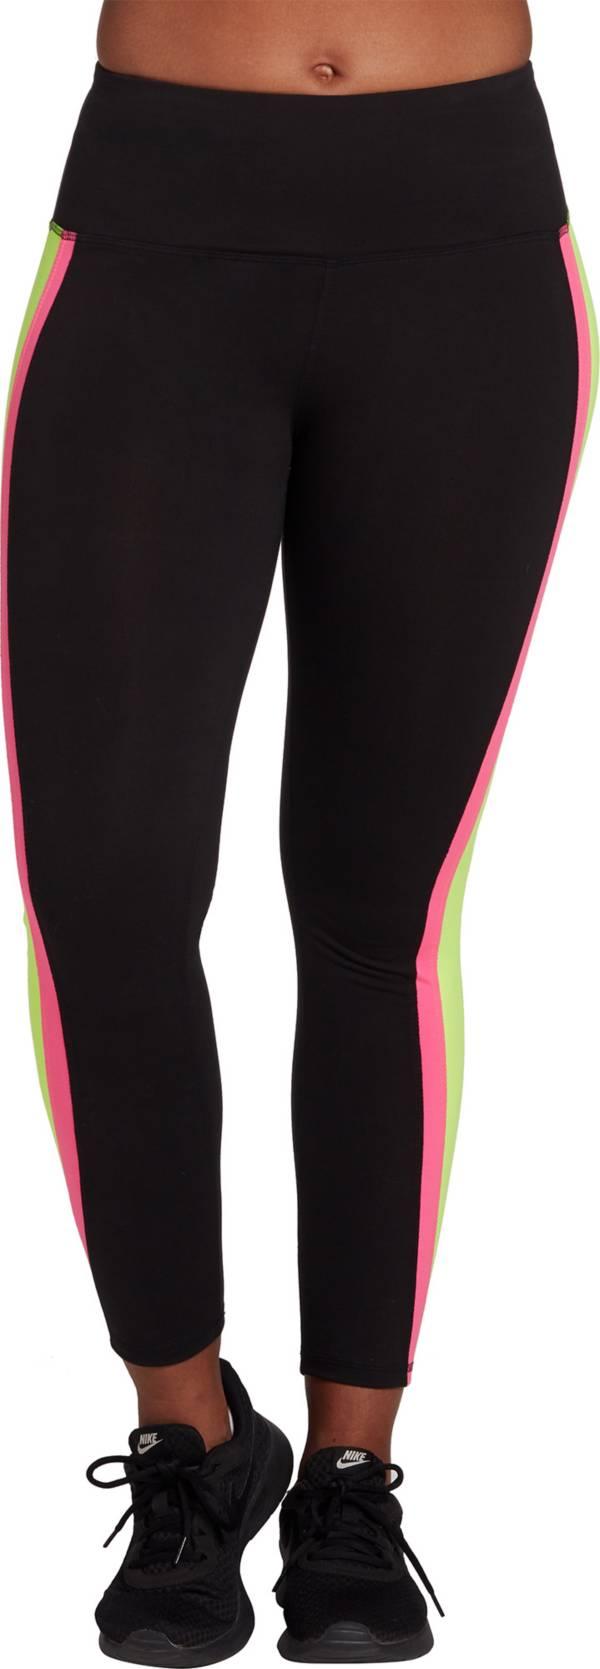 DSG Women's Neon Side Stripe Leggings (Regular and Plus) product image